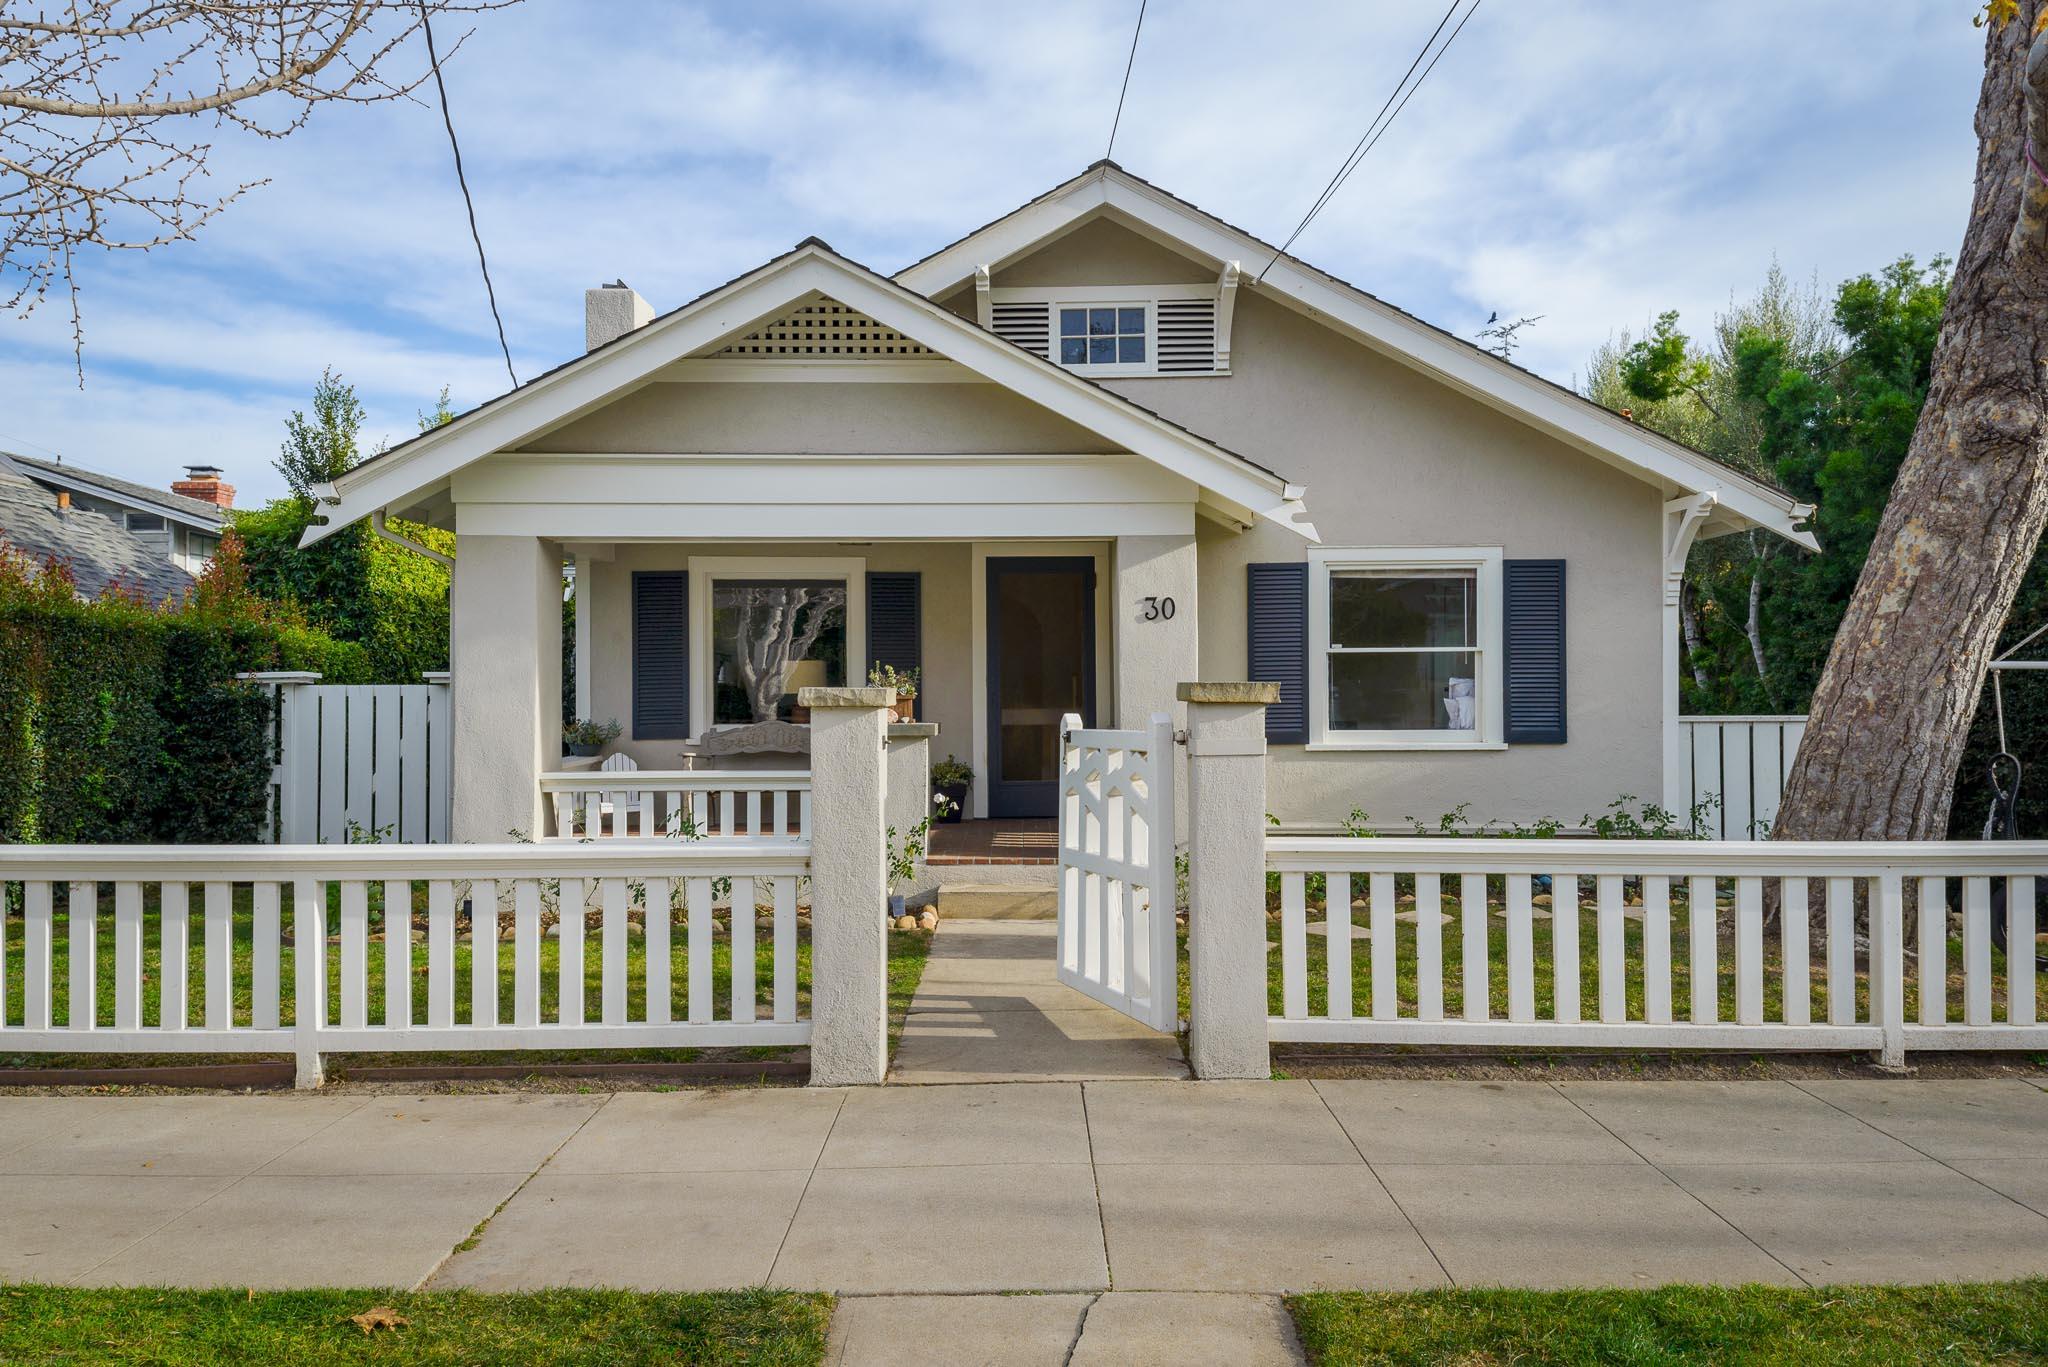 Property photo for 30 E Quinto St Santa Barbara, California 93105 - 18-320